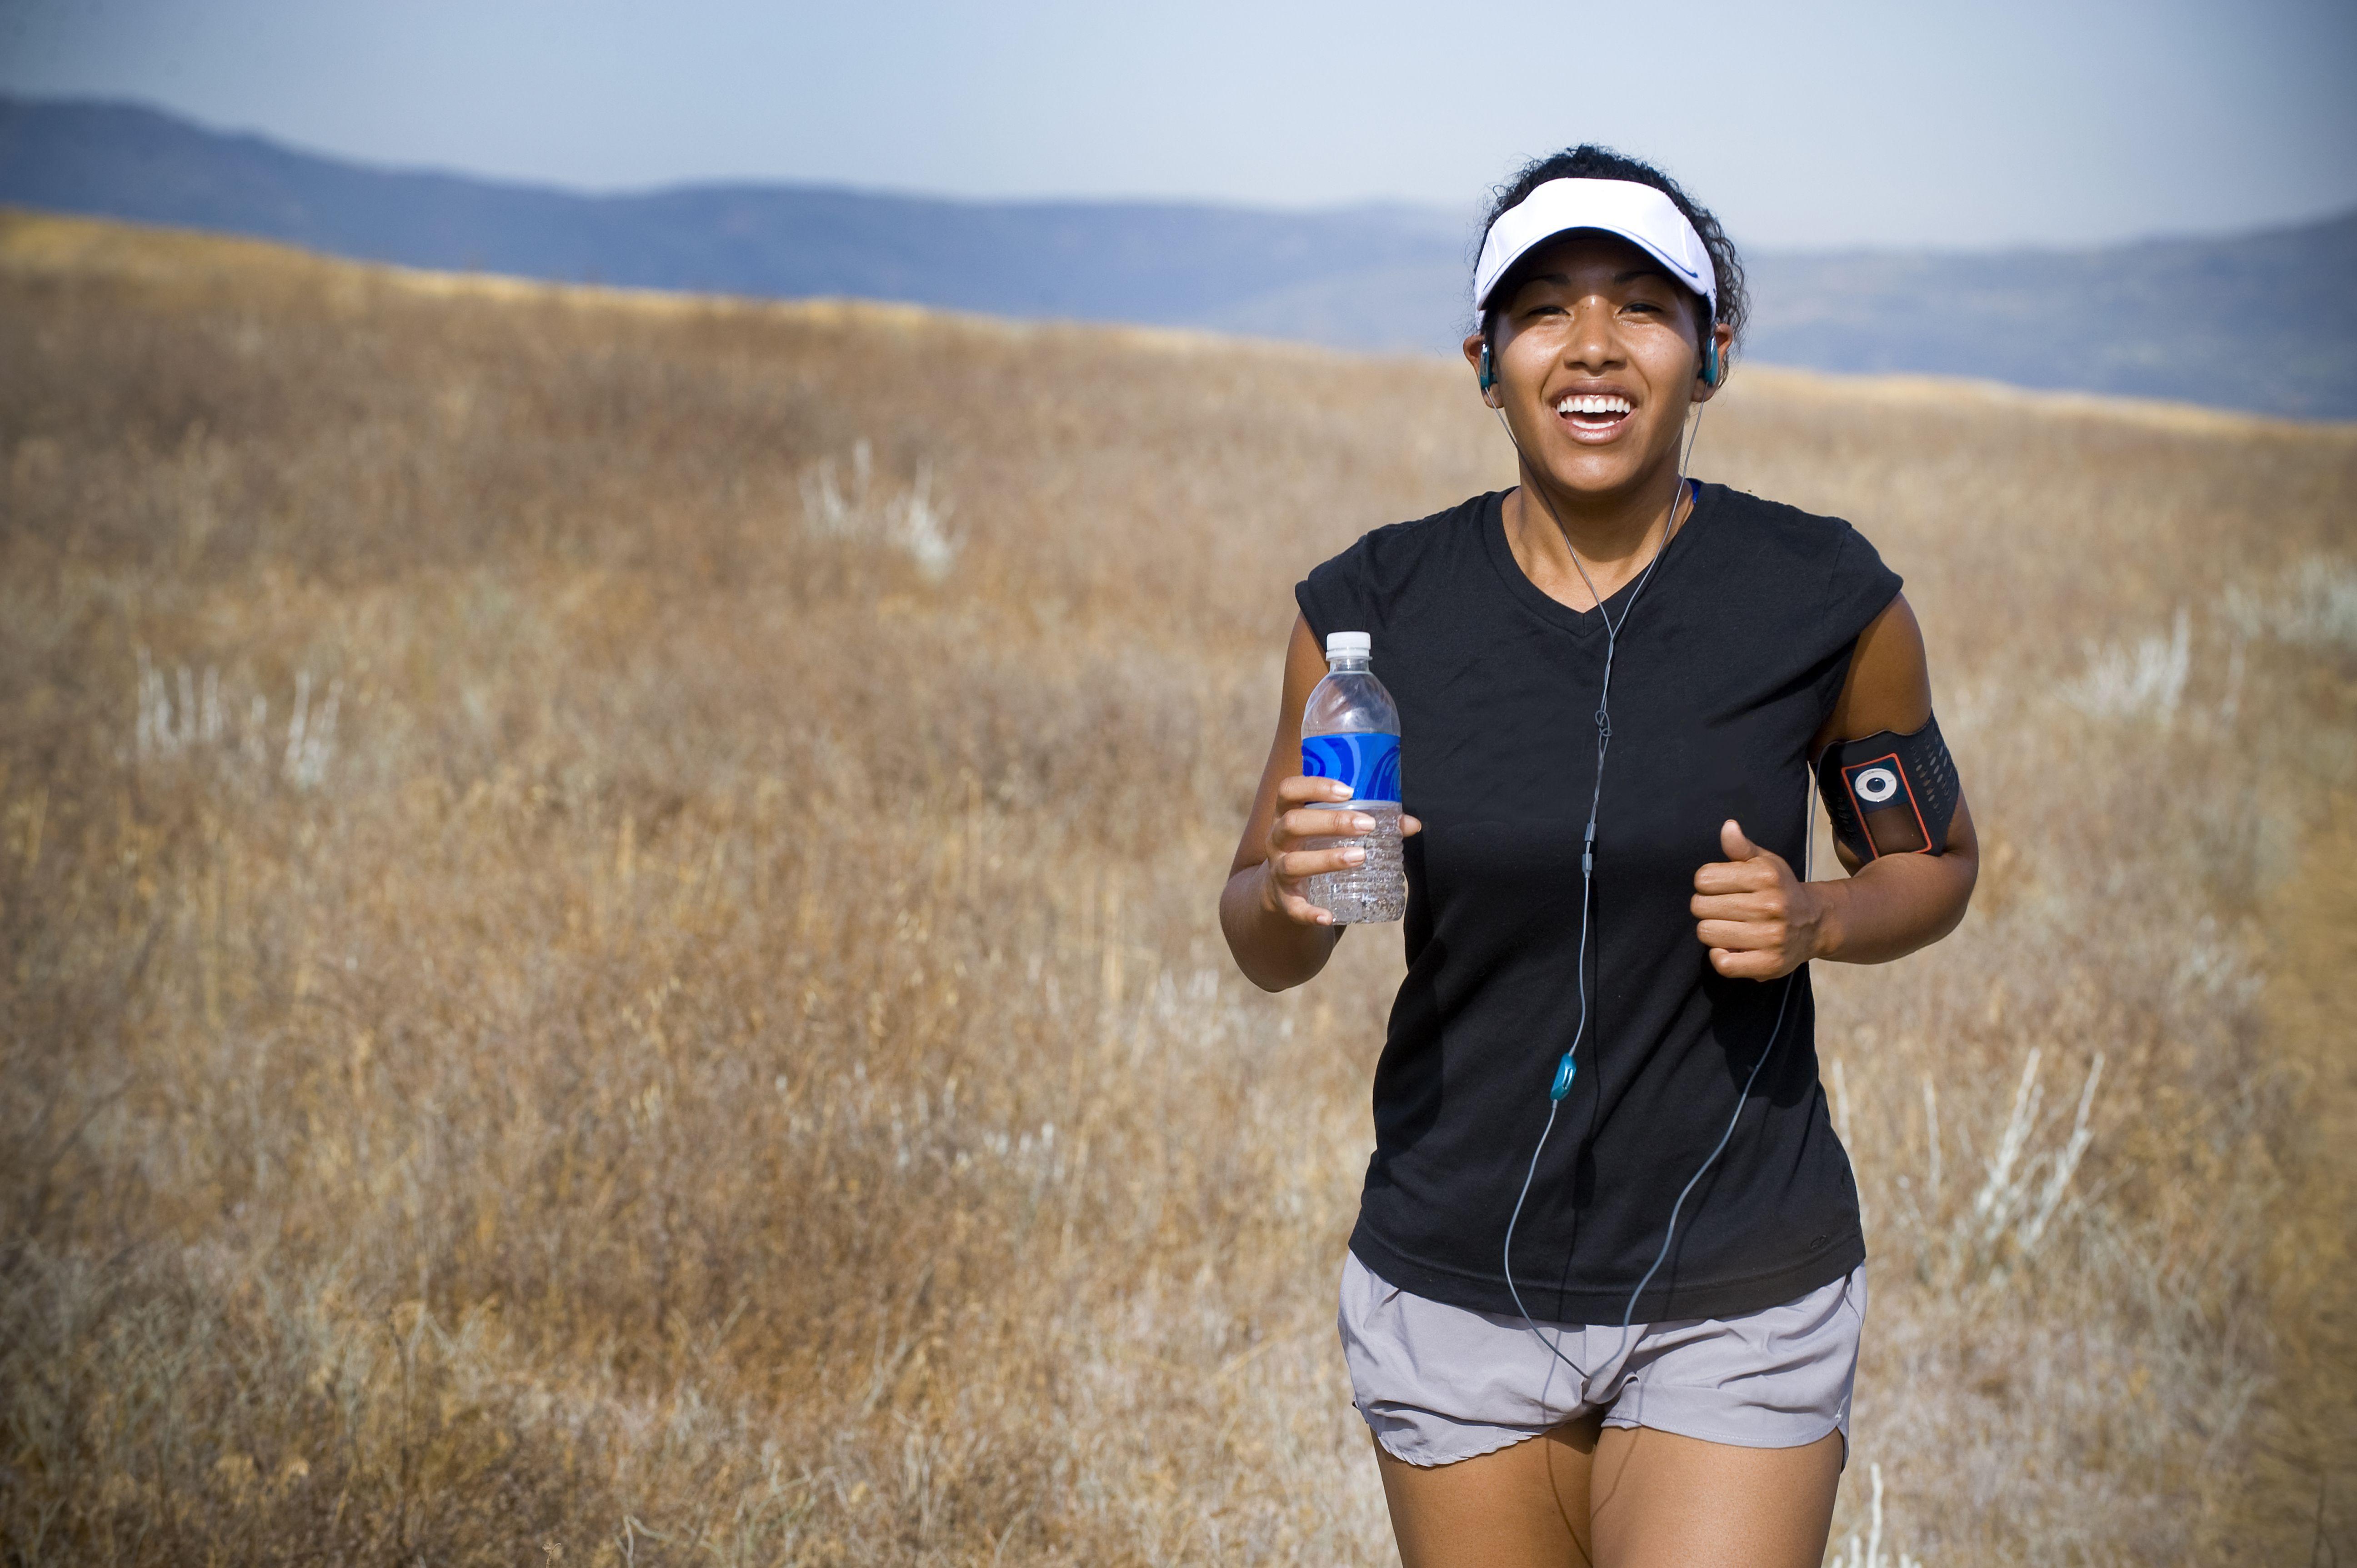 Women running with water